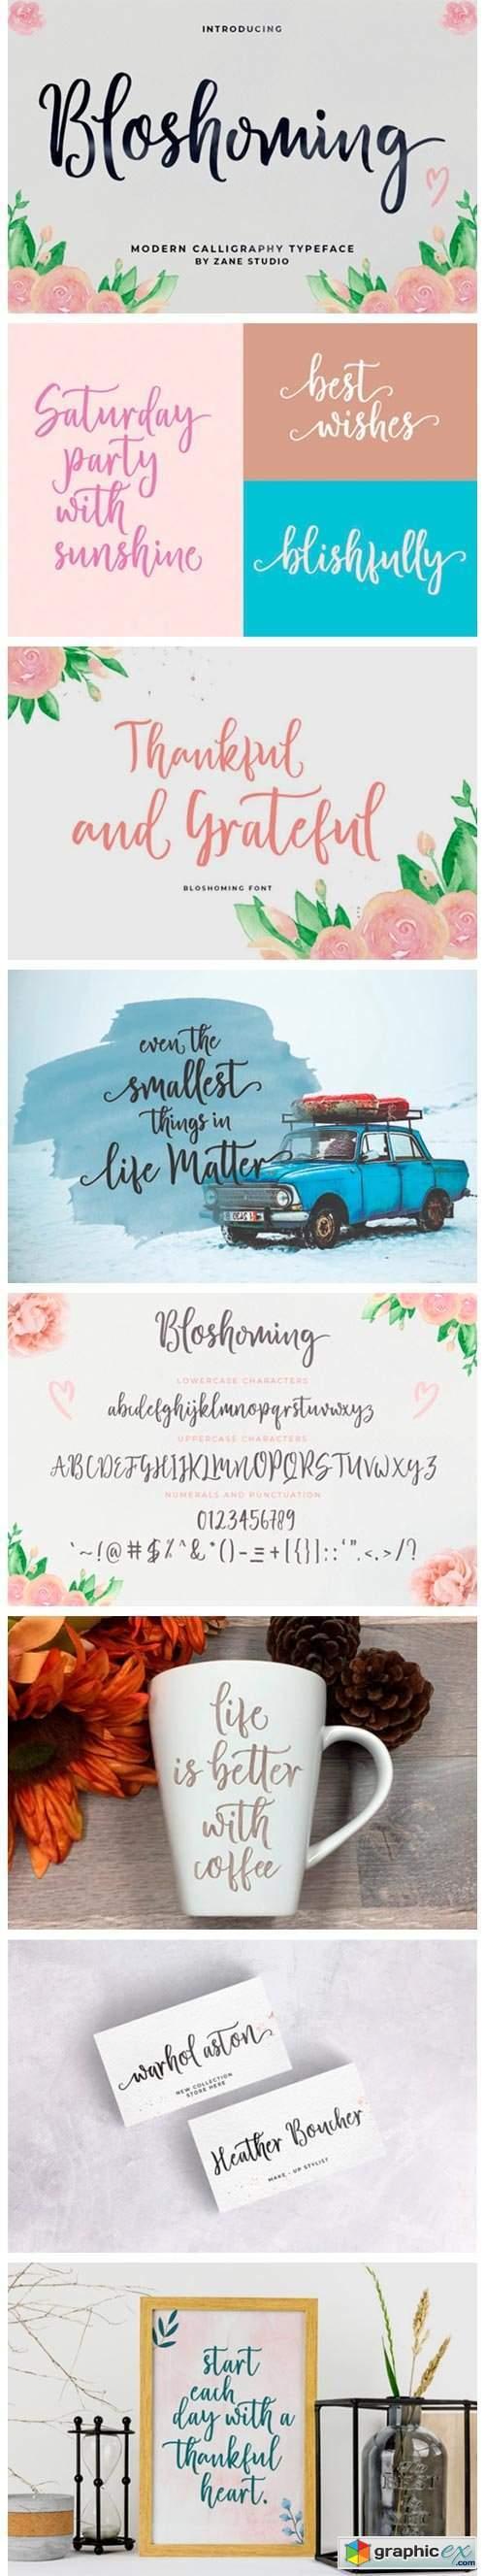 Bloshoming Font